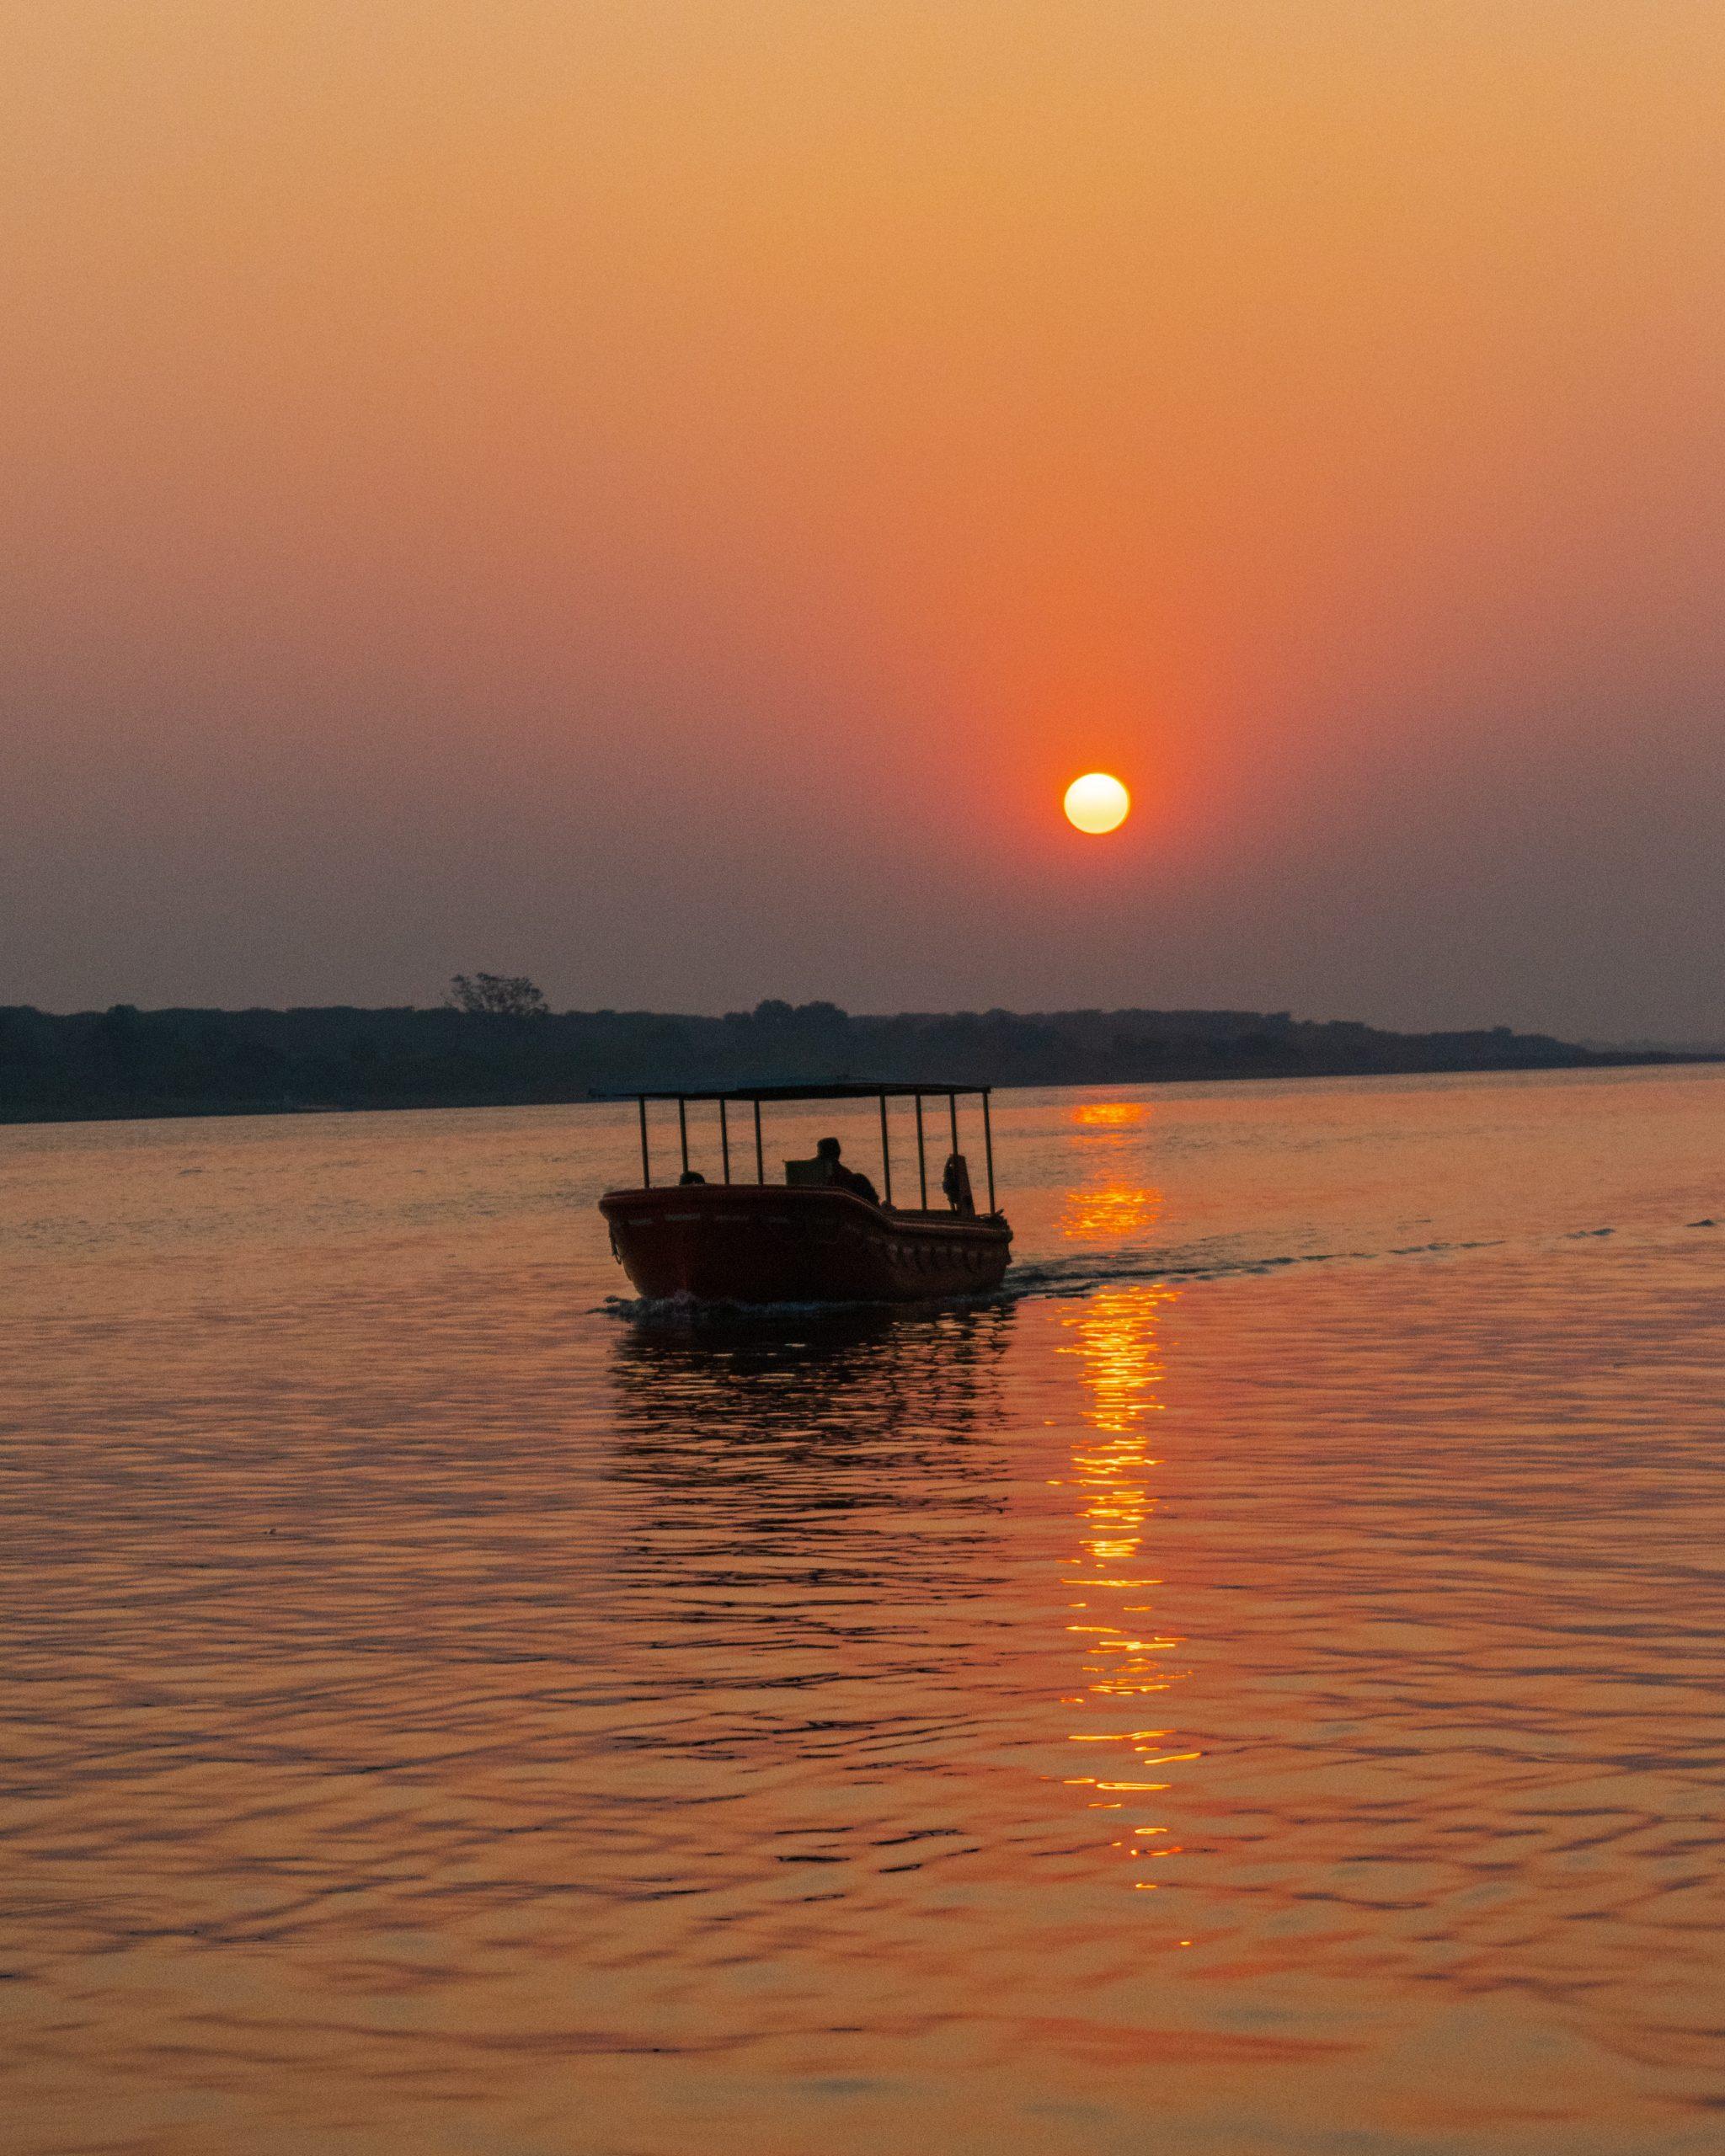 Boat sailing during sunset